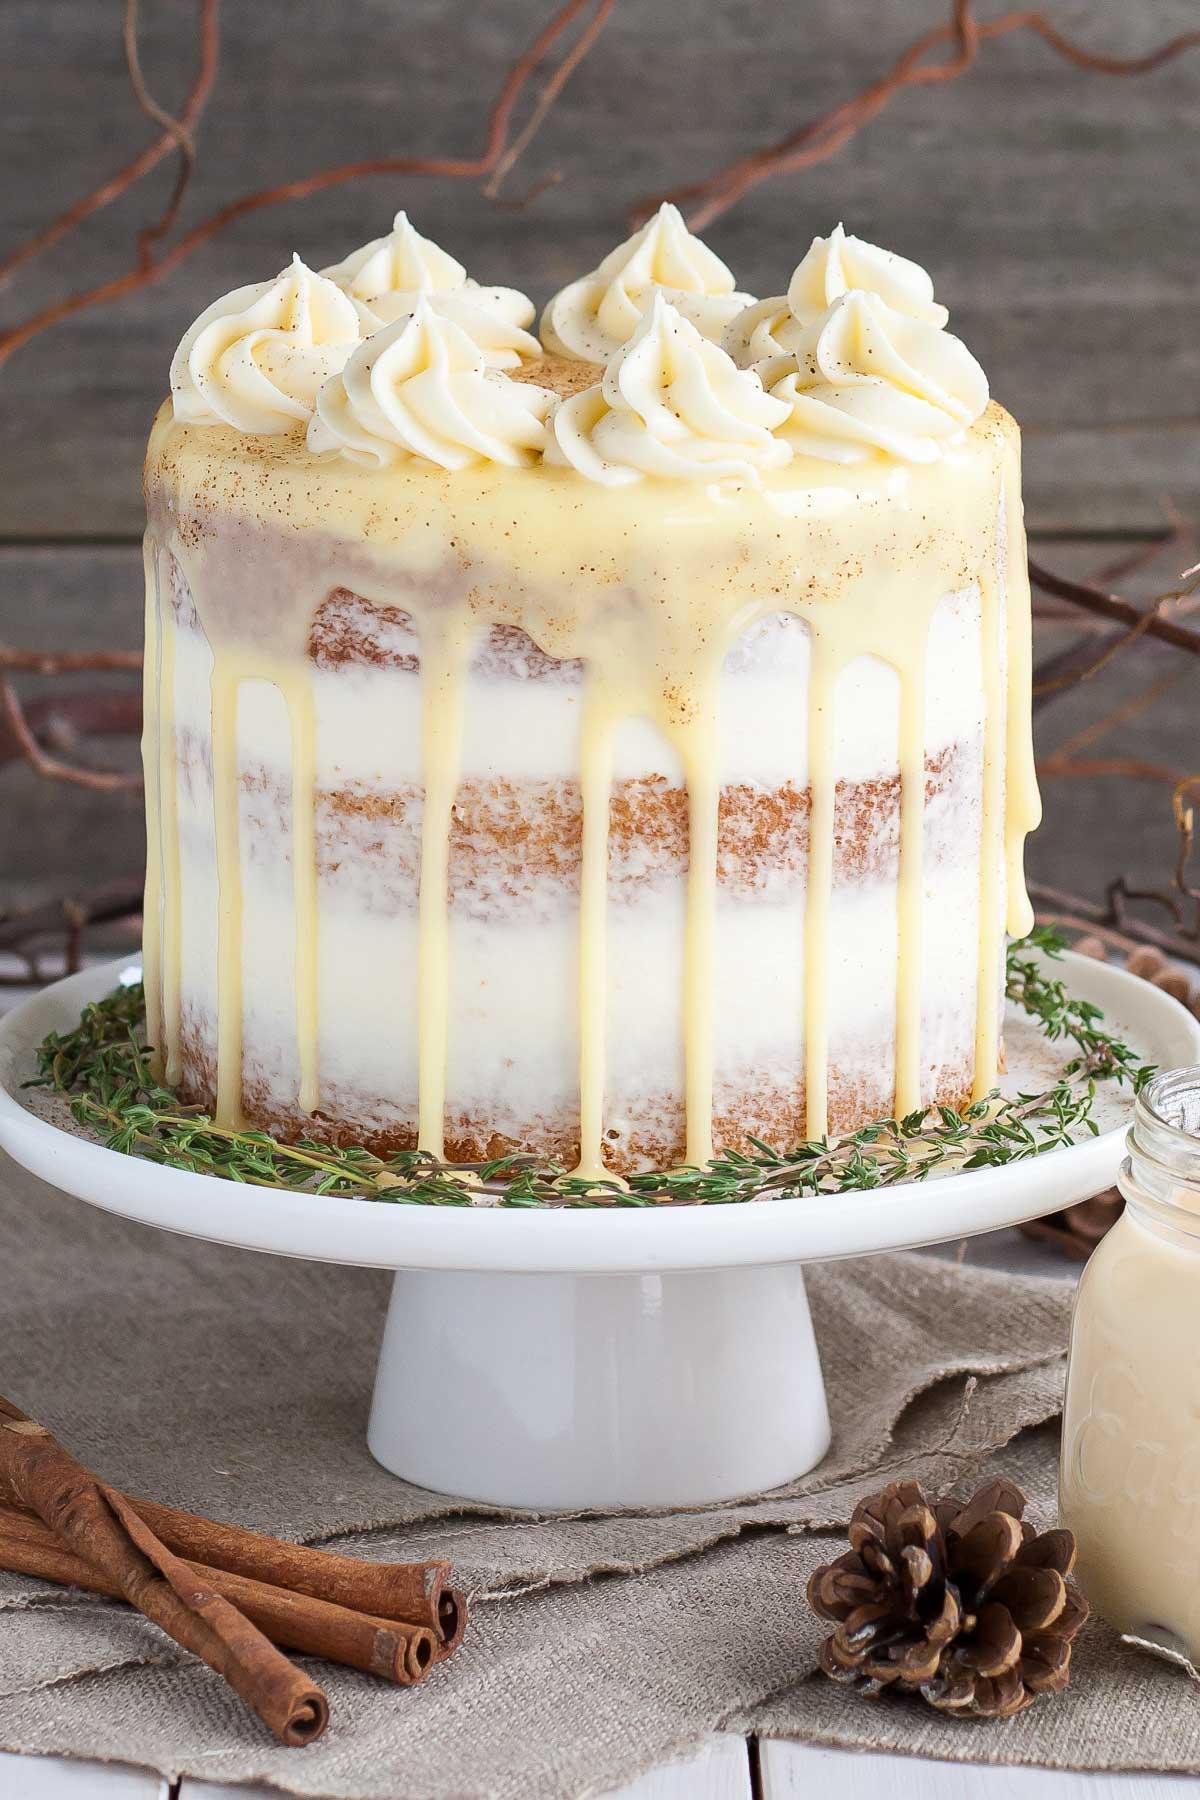 Cream cream for cake: four different recipes